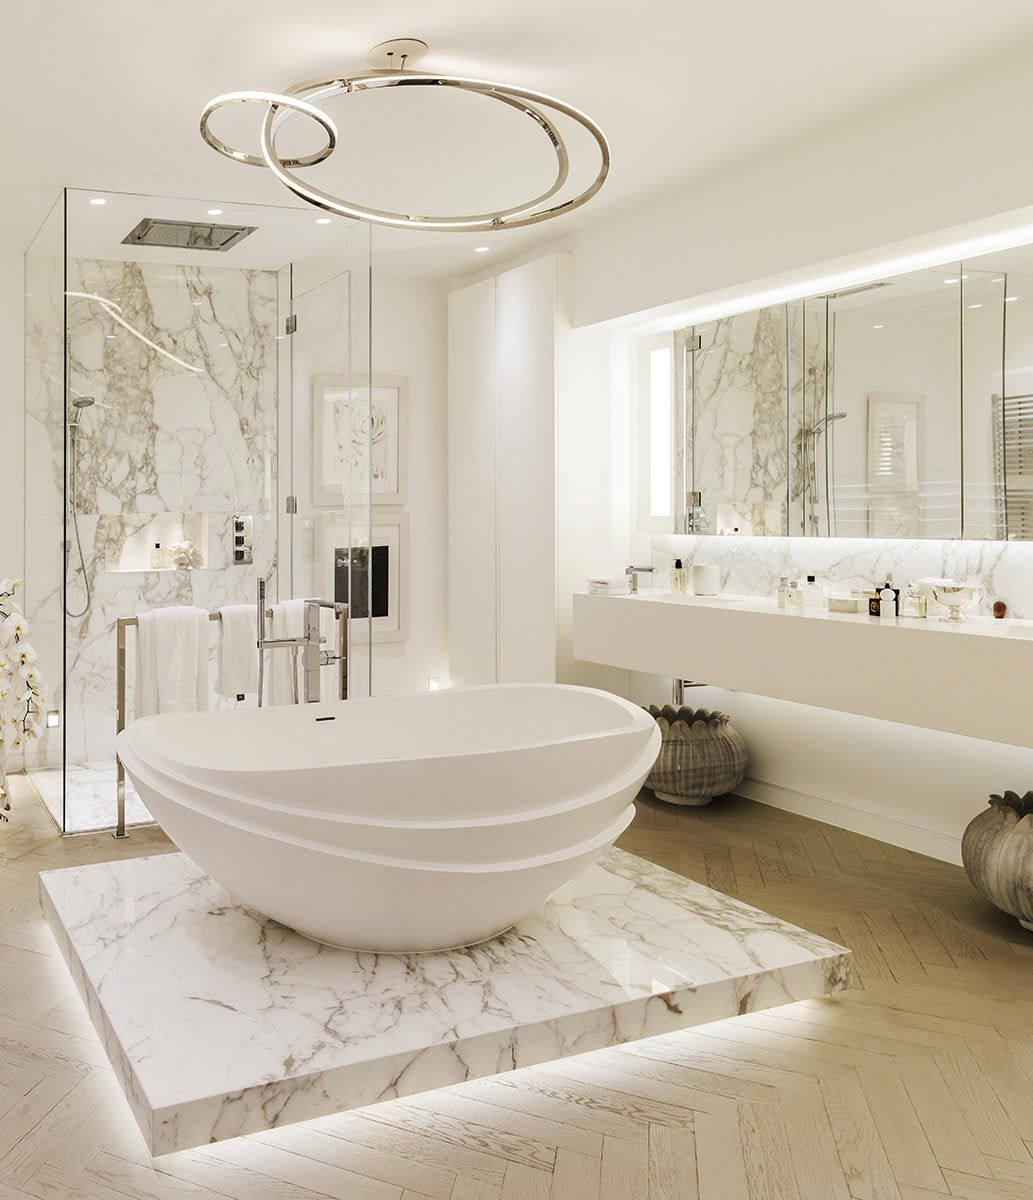 Kelly Hoppen Look Master Bathroom Marble Bathroom Designs Kelly Hoppen Interiors Bathroom Interior Design